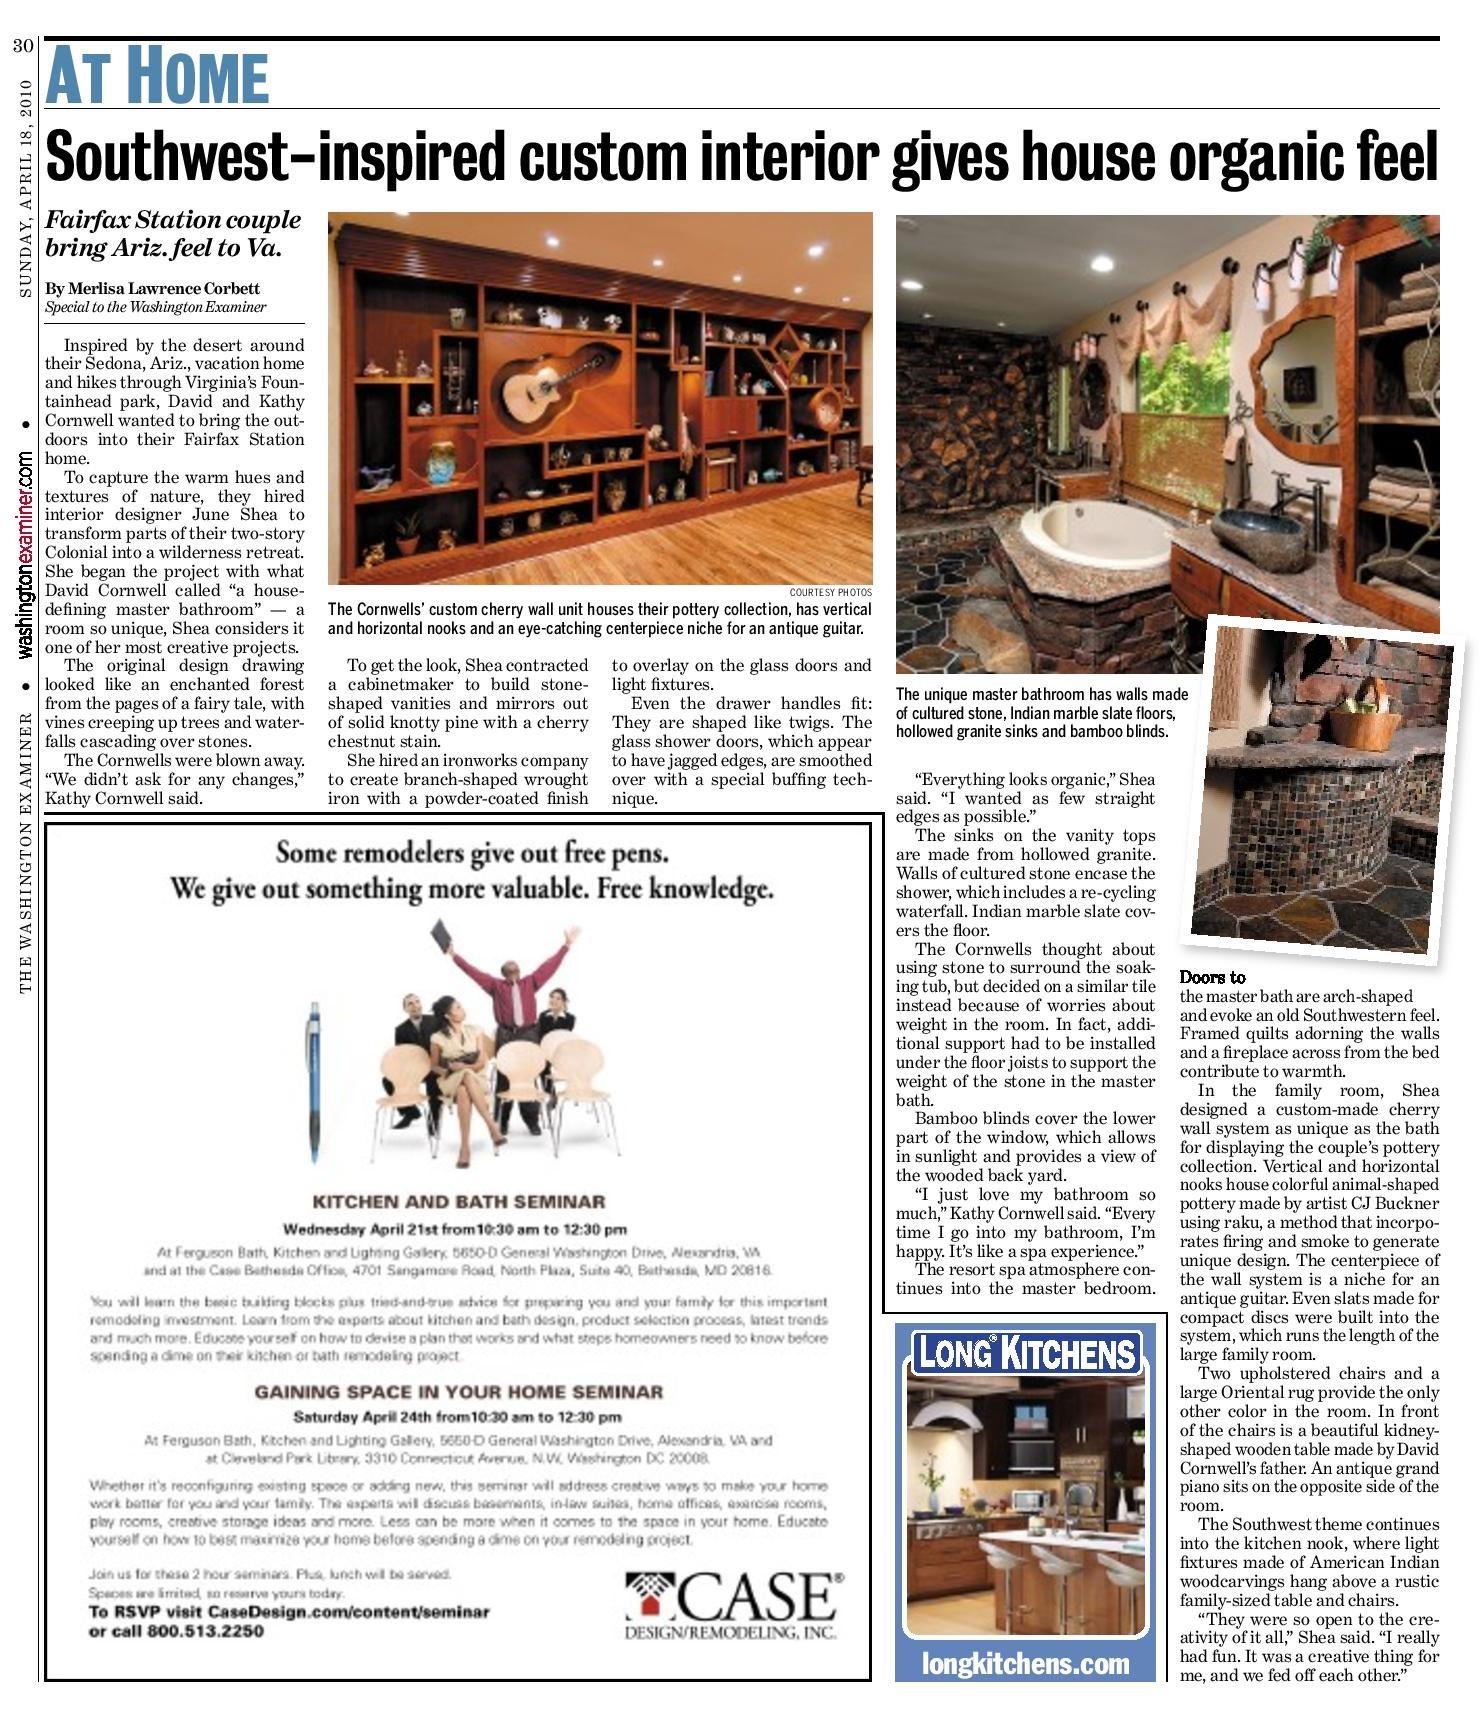 Cornwell examiner 4-18-10-page-001.jpg